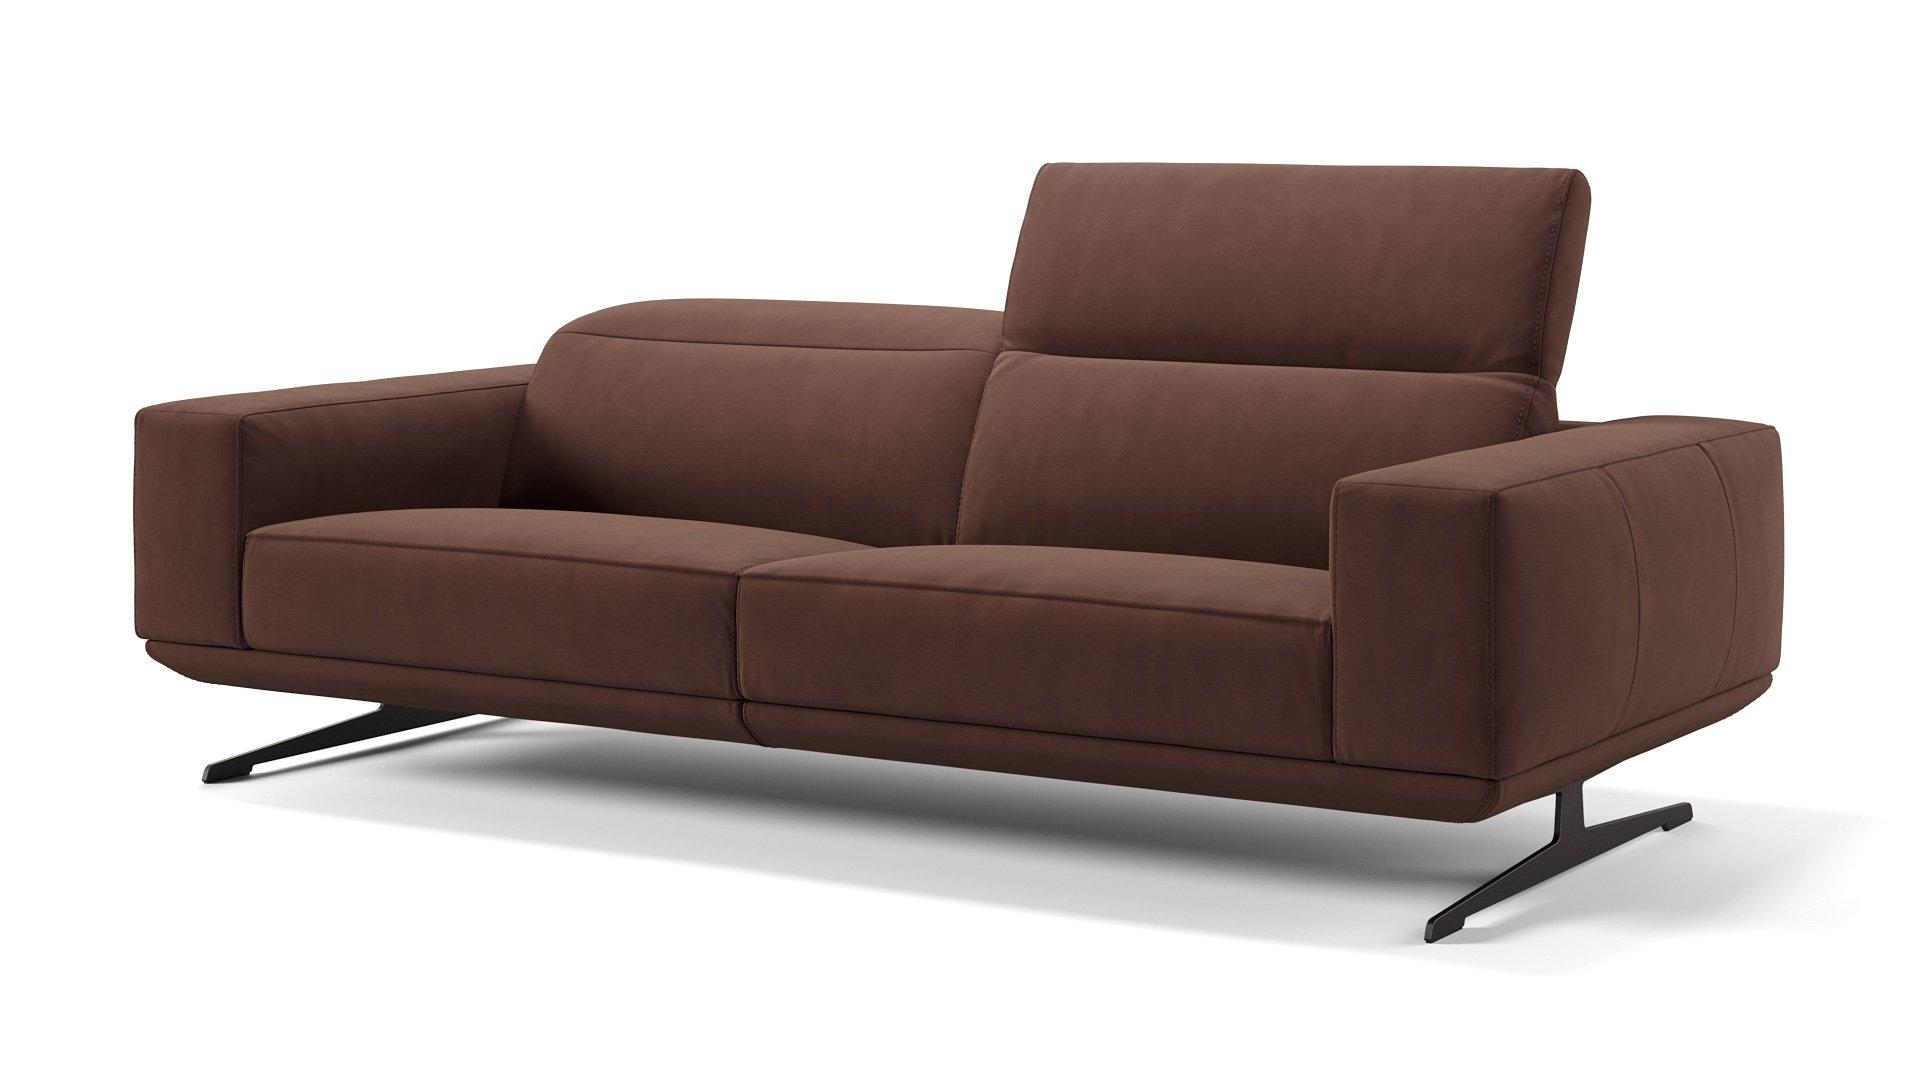 Stoff 3-Sitzer Sofa MERANO